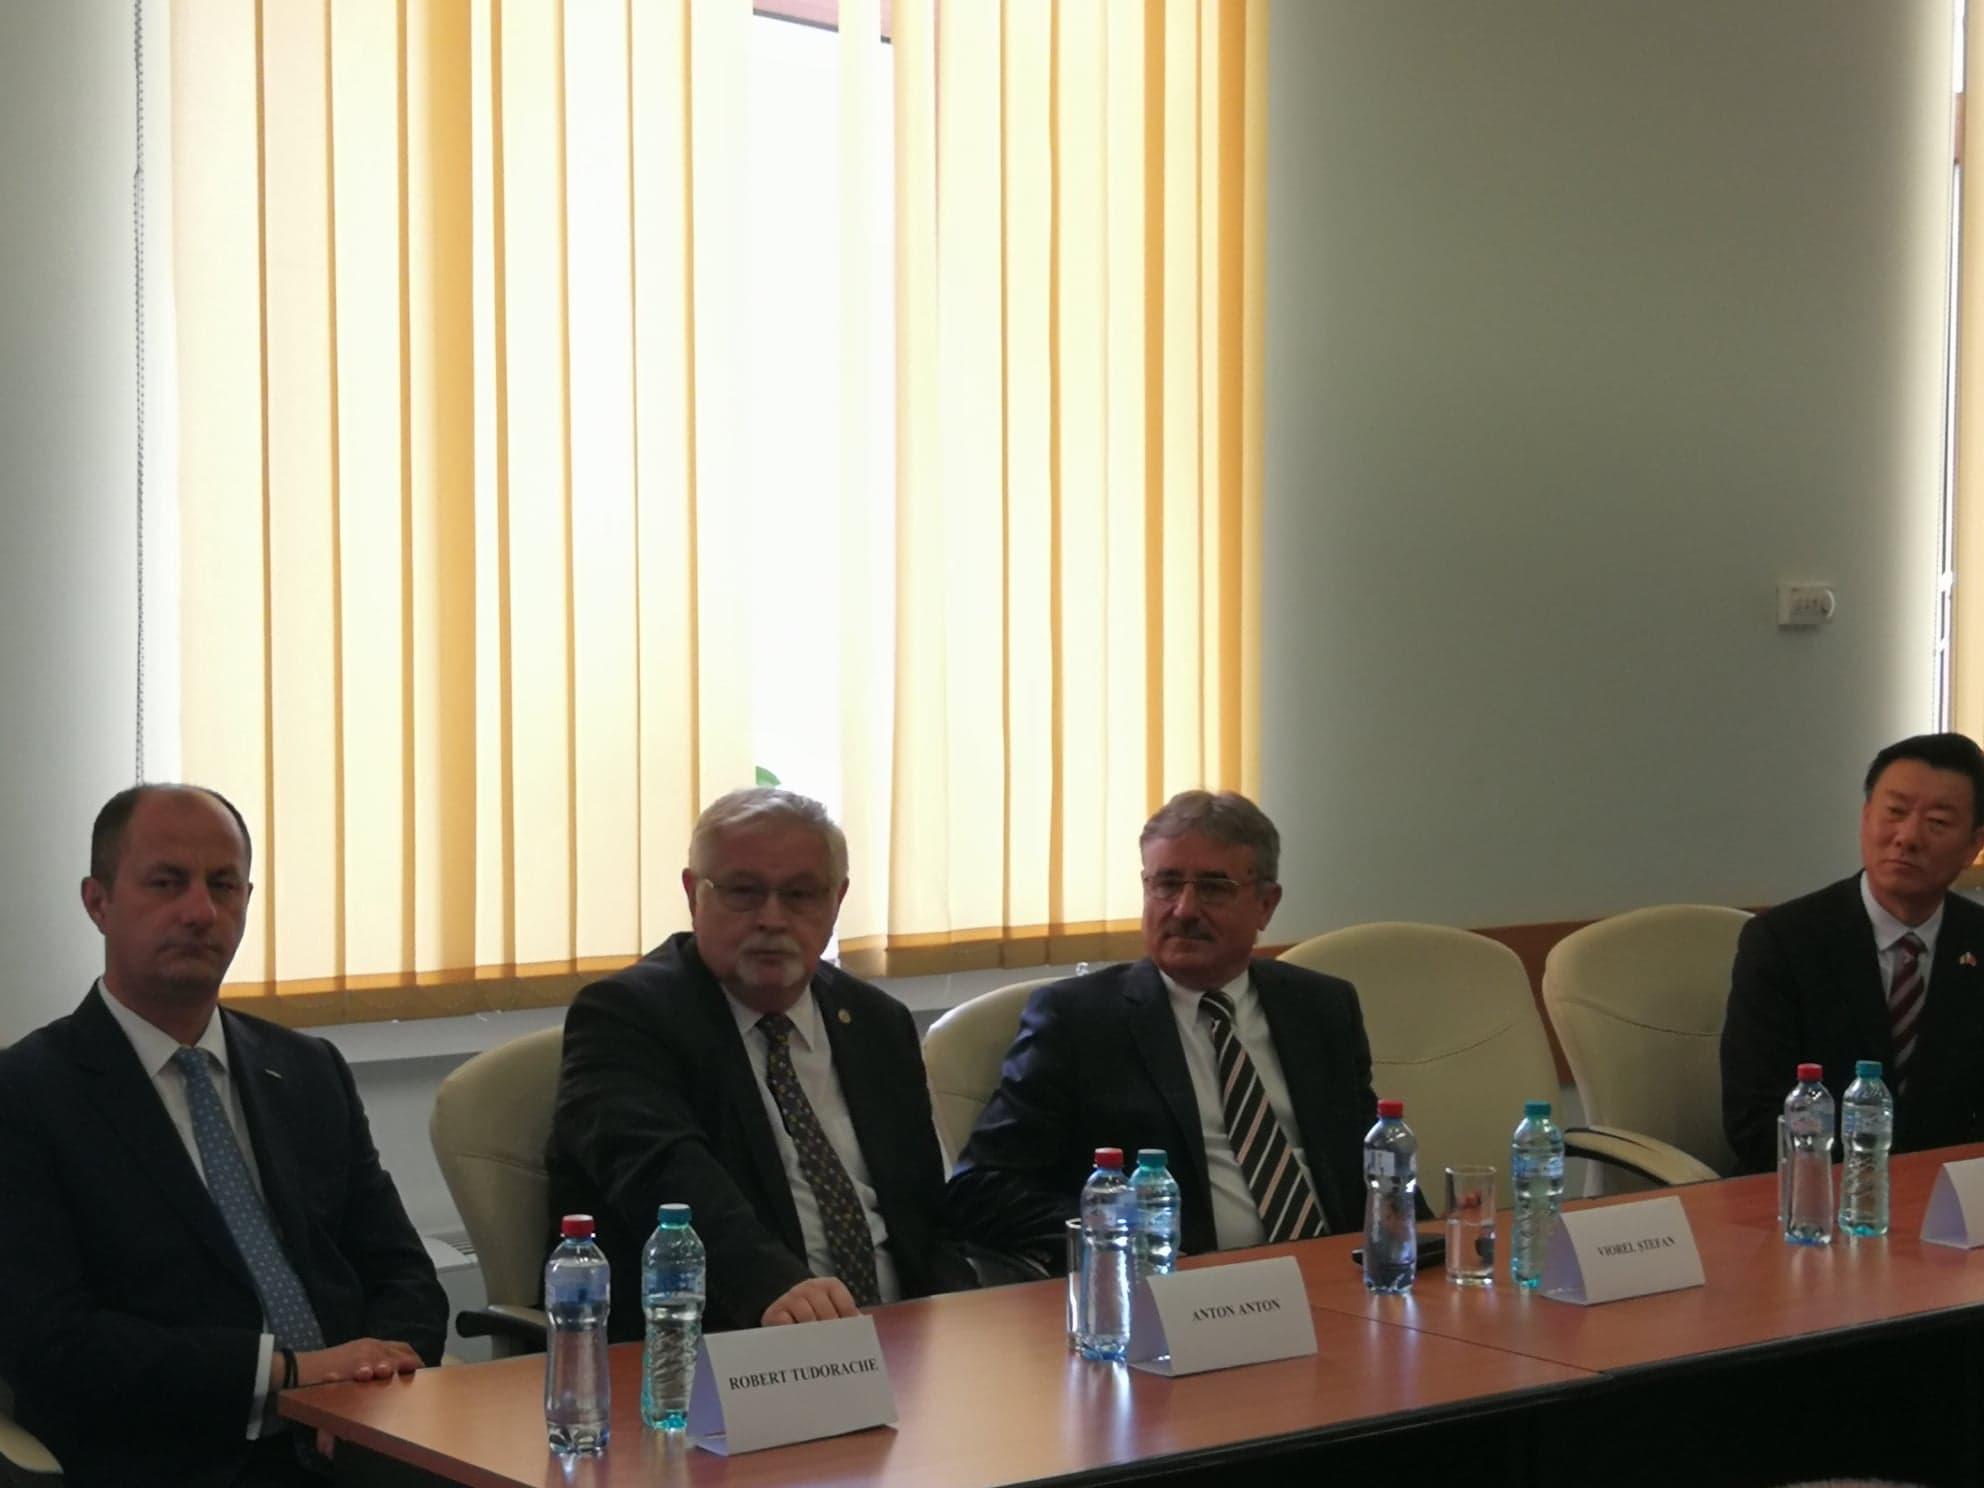 Ceremonie semnare acord de investiții cu CGN